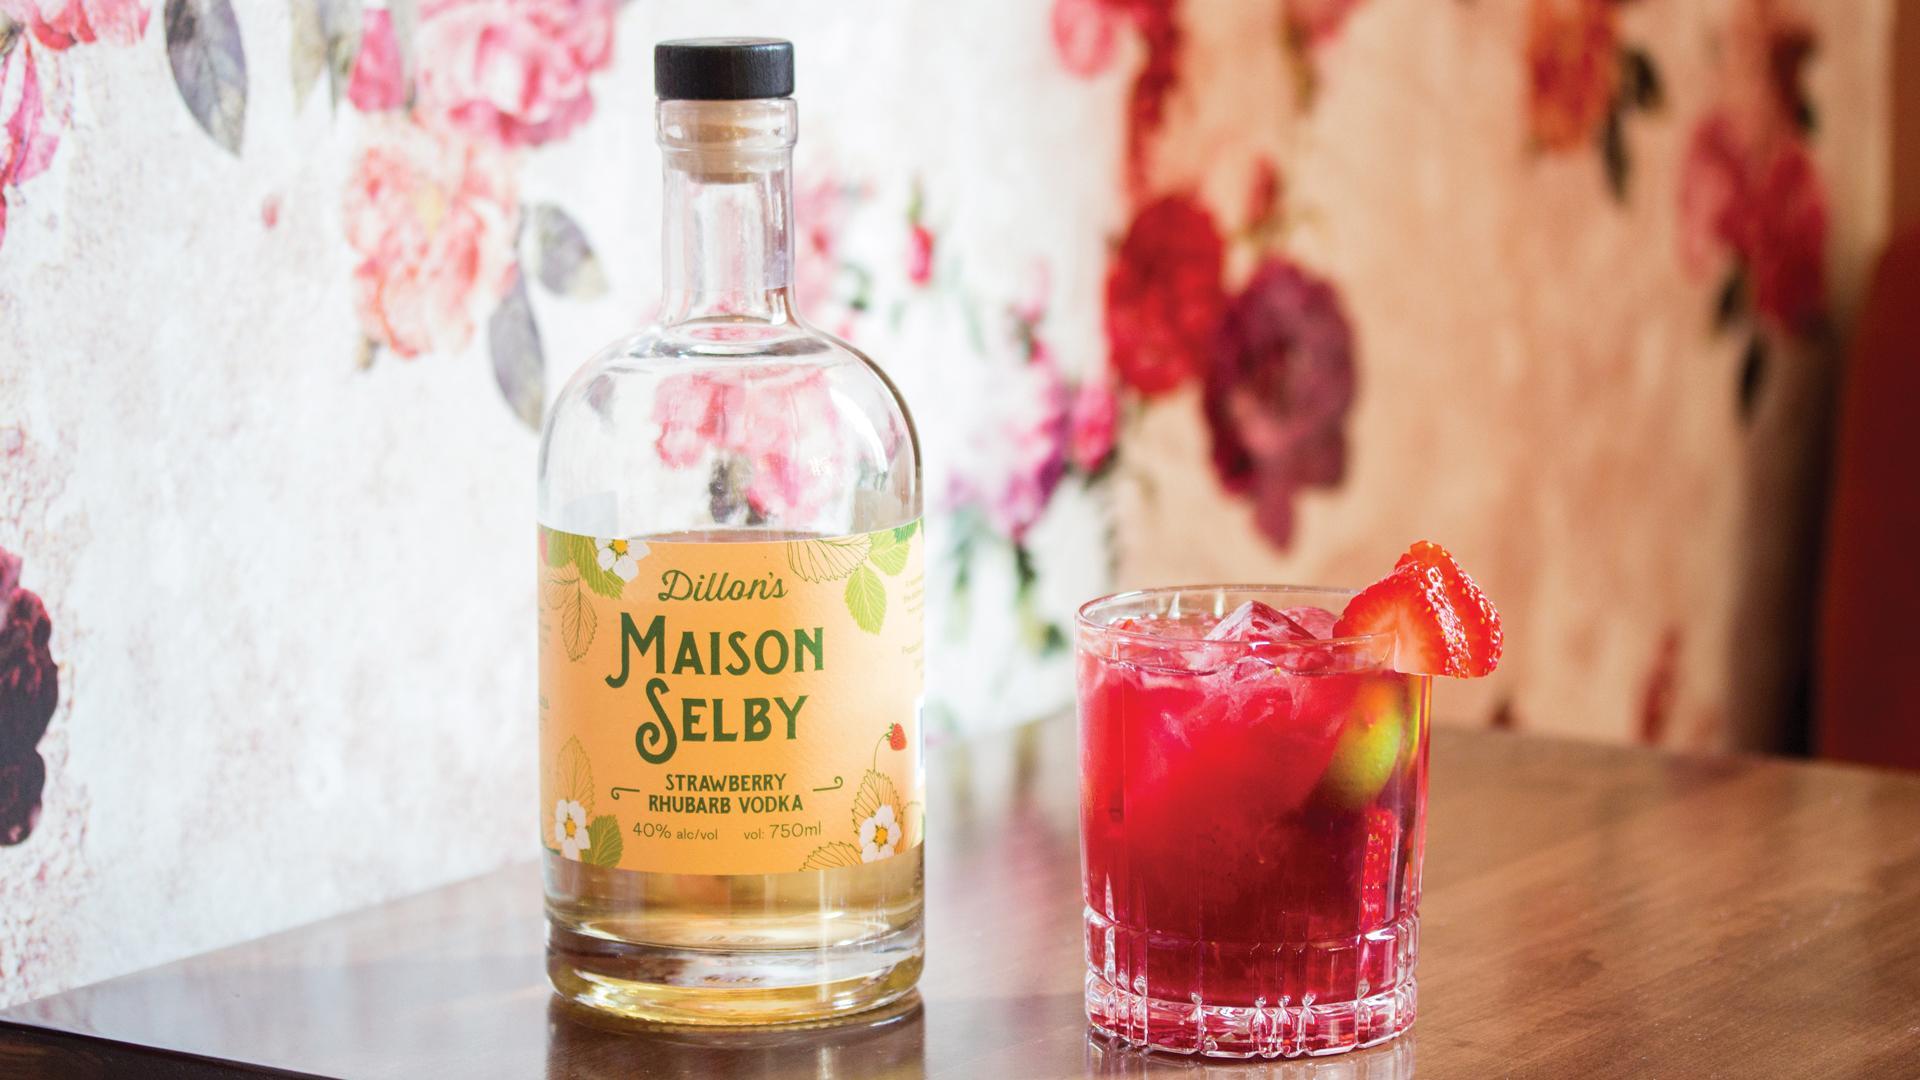 Ontario distilleries   Maison Selby Strawberry Rhubarb Vodka